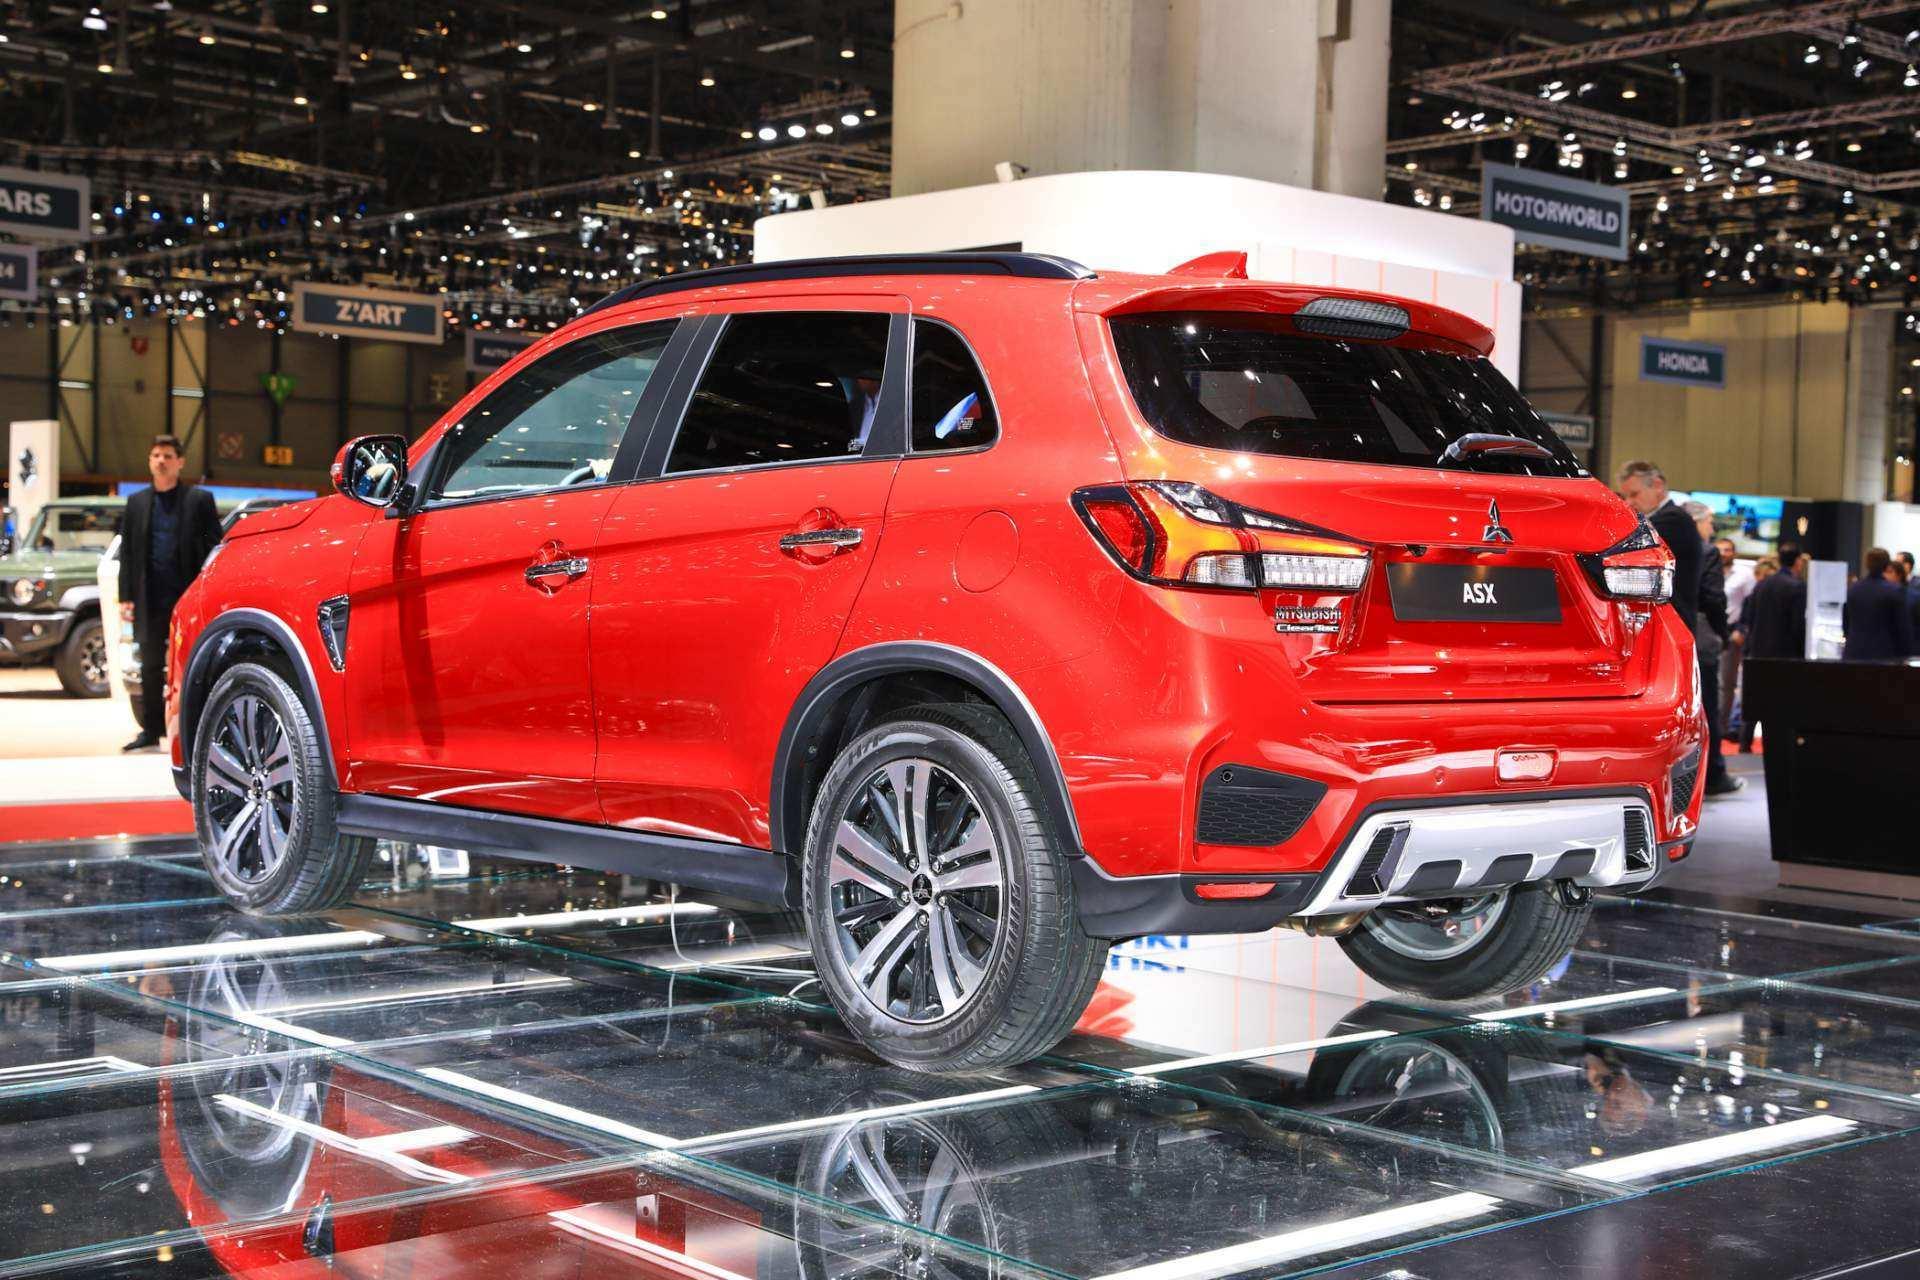 41 Concept of Mitsubishi Asx 2020 Uk Redesign for Mitsubishi Asx 2020 Uk